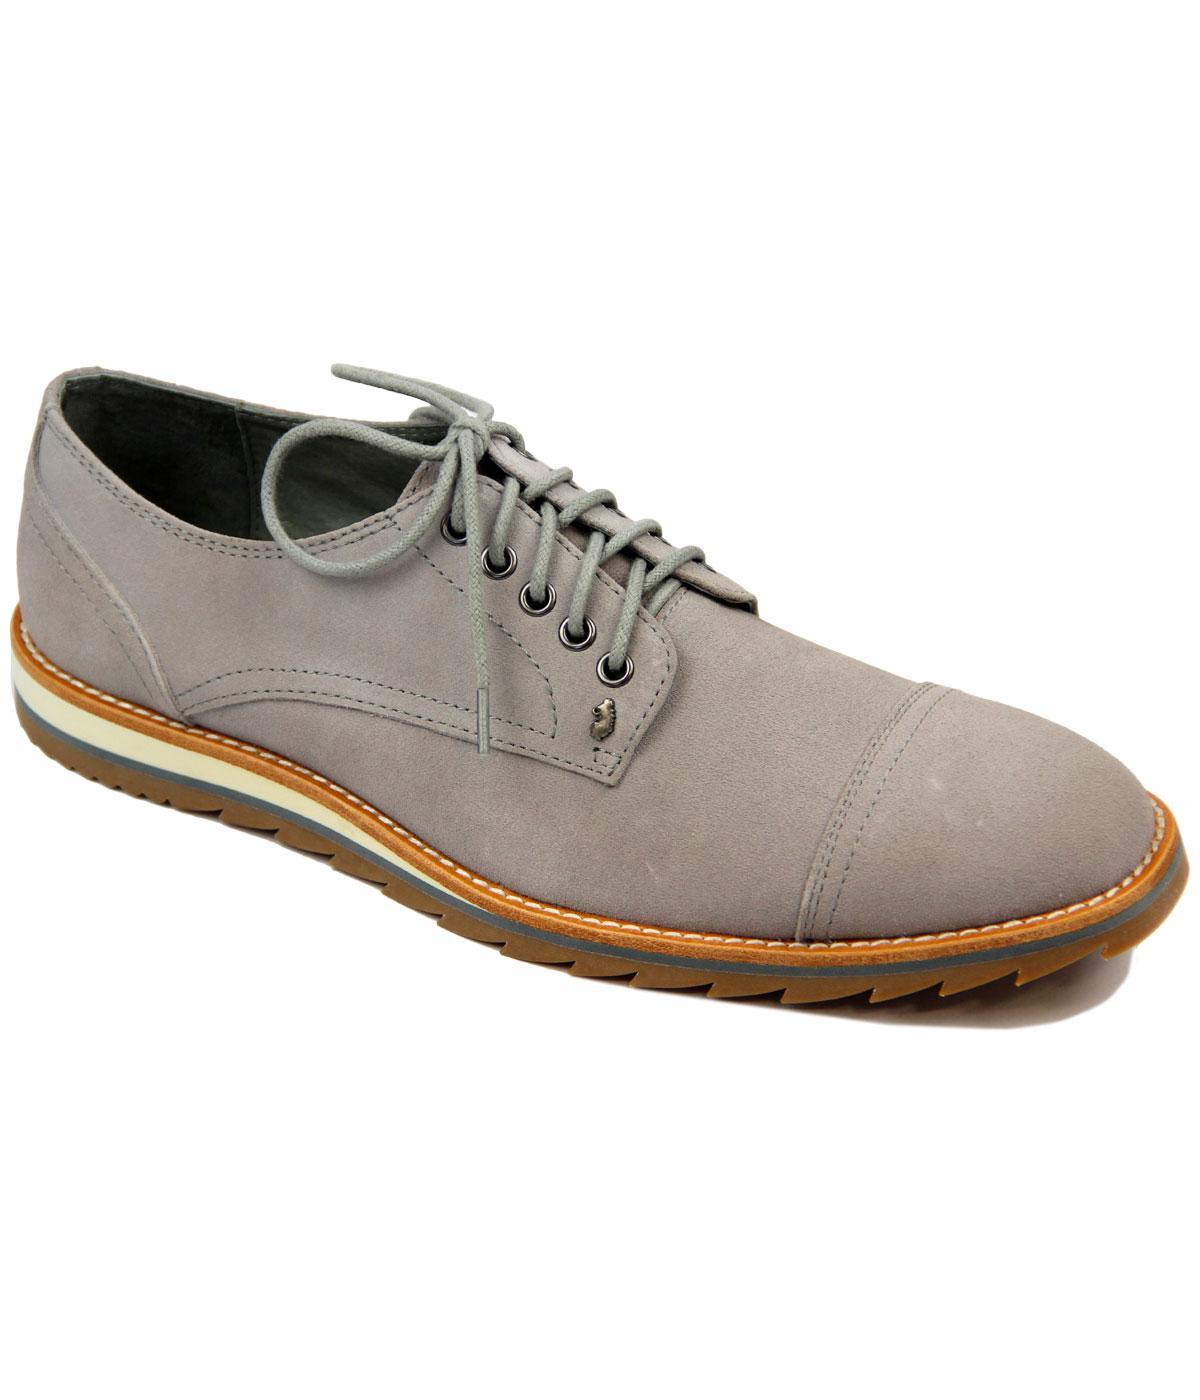 Turners Toe Cap LUKE 1977 Retro Mod Suede Shoes G